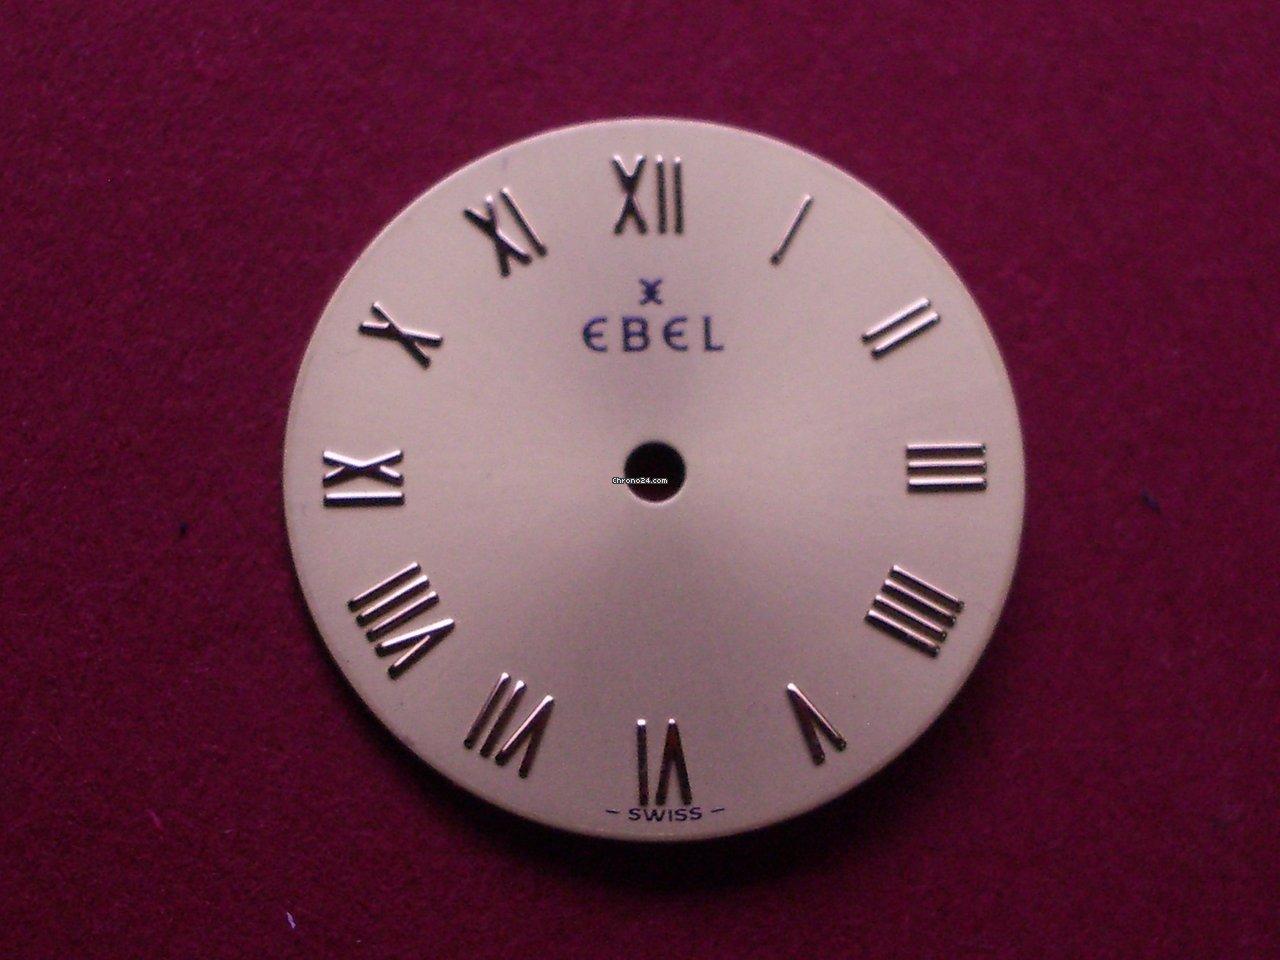 Ebel 1911 new